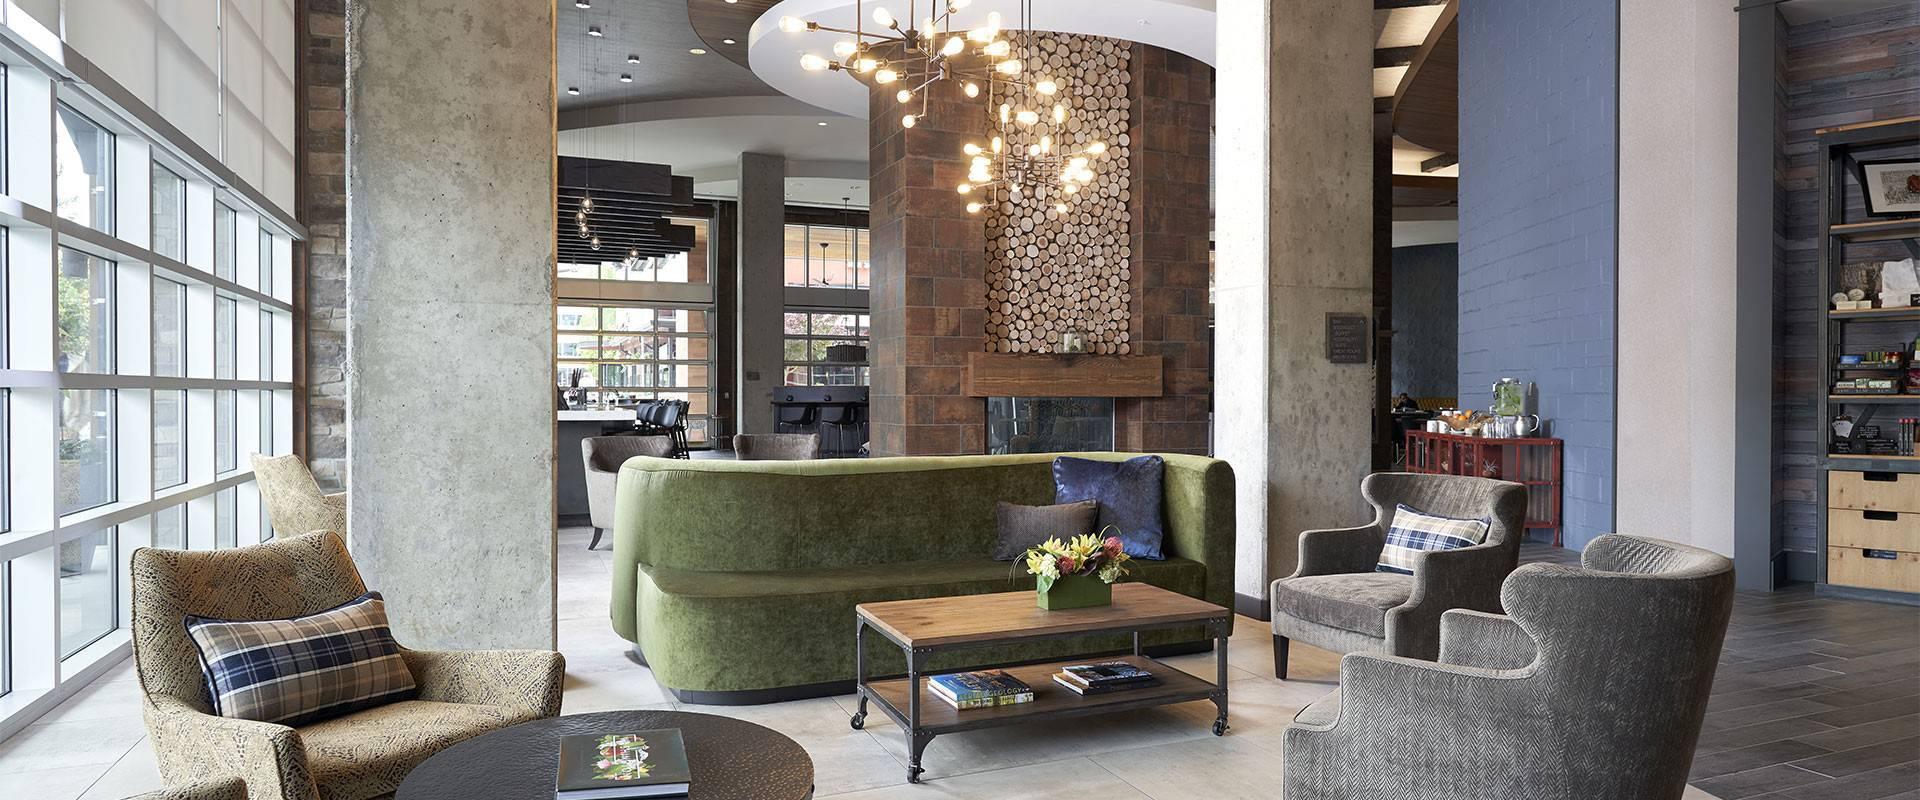 Archer Hotel Redmond lobby